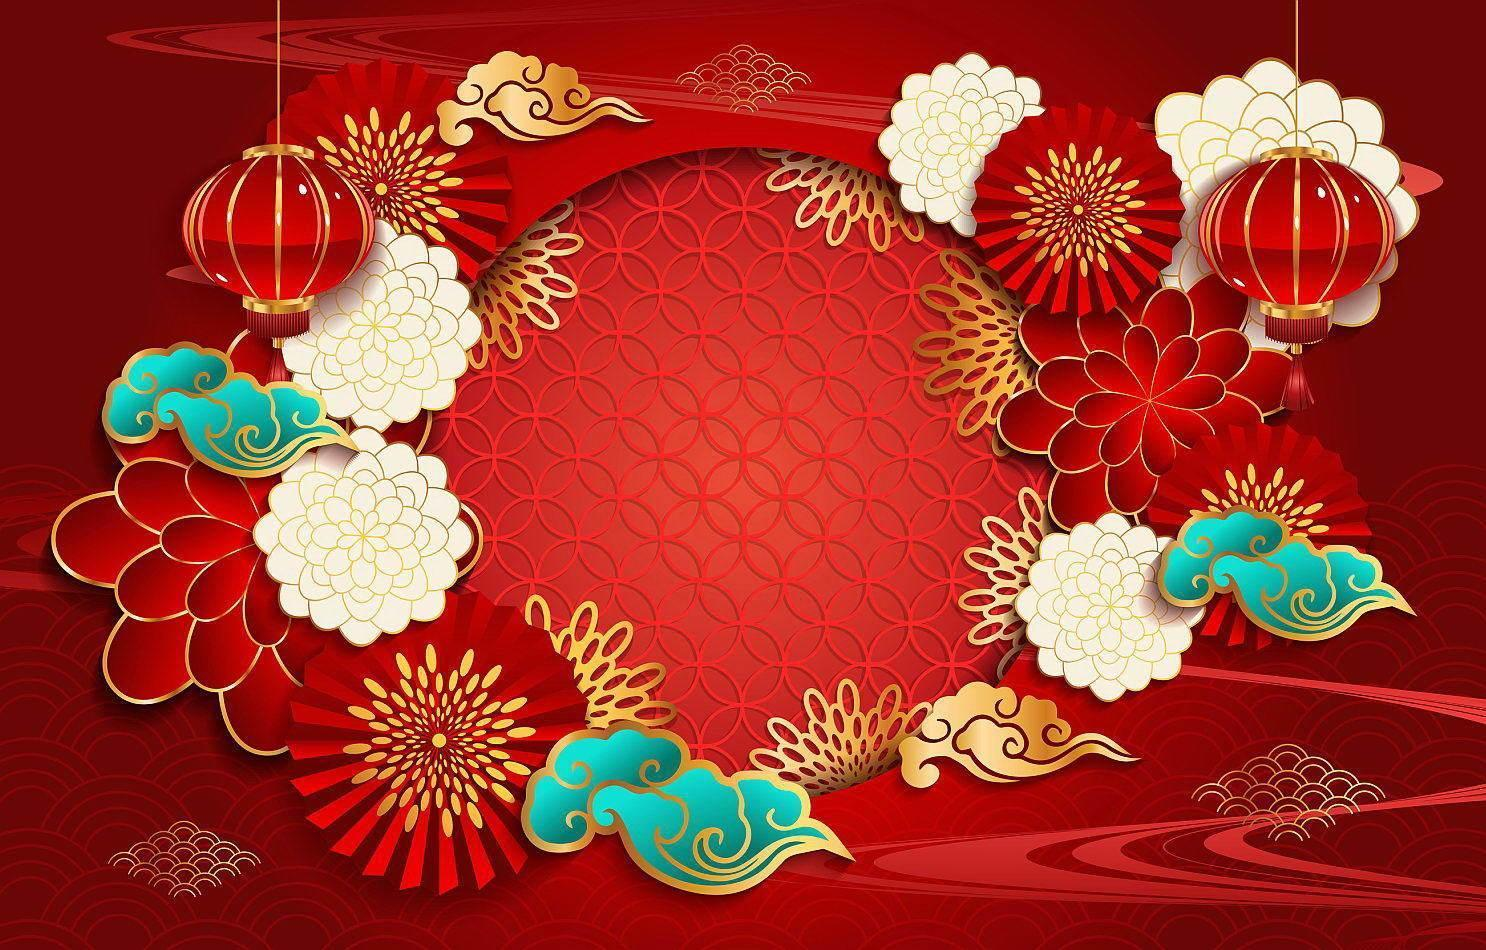 kinesiska nyår festlighet bakgrund koncept vektor